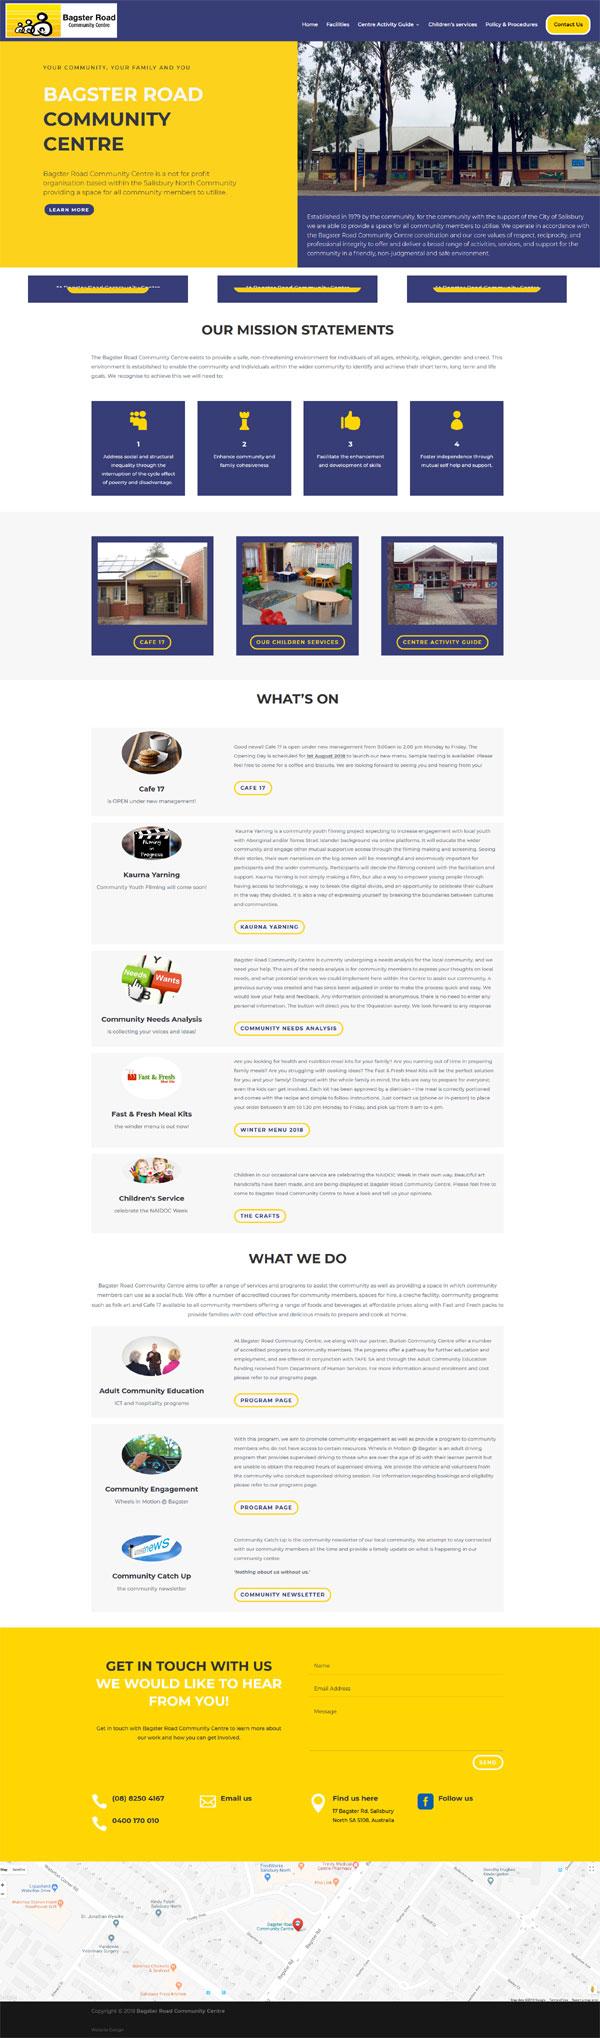 bagsterroadcc-website